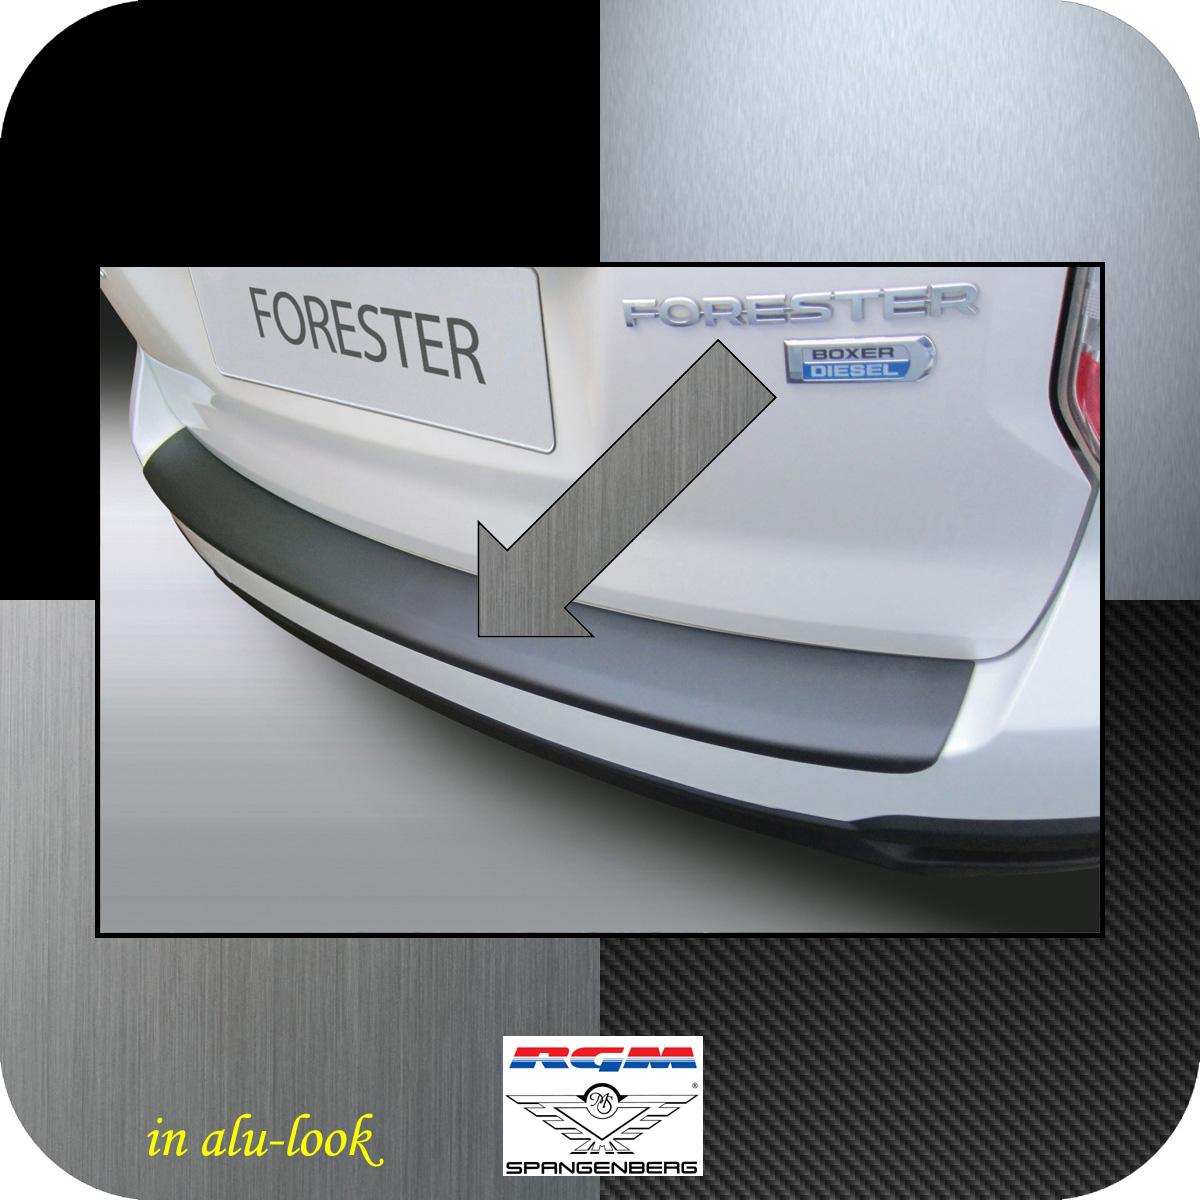 Ladekantenschutz Alu-Look Subaru Forester SUV ab facelift 03.2016- 3504650